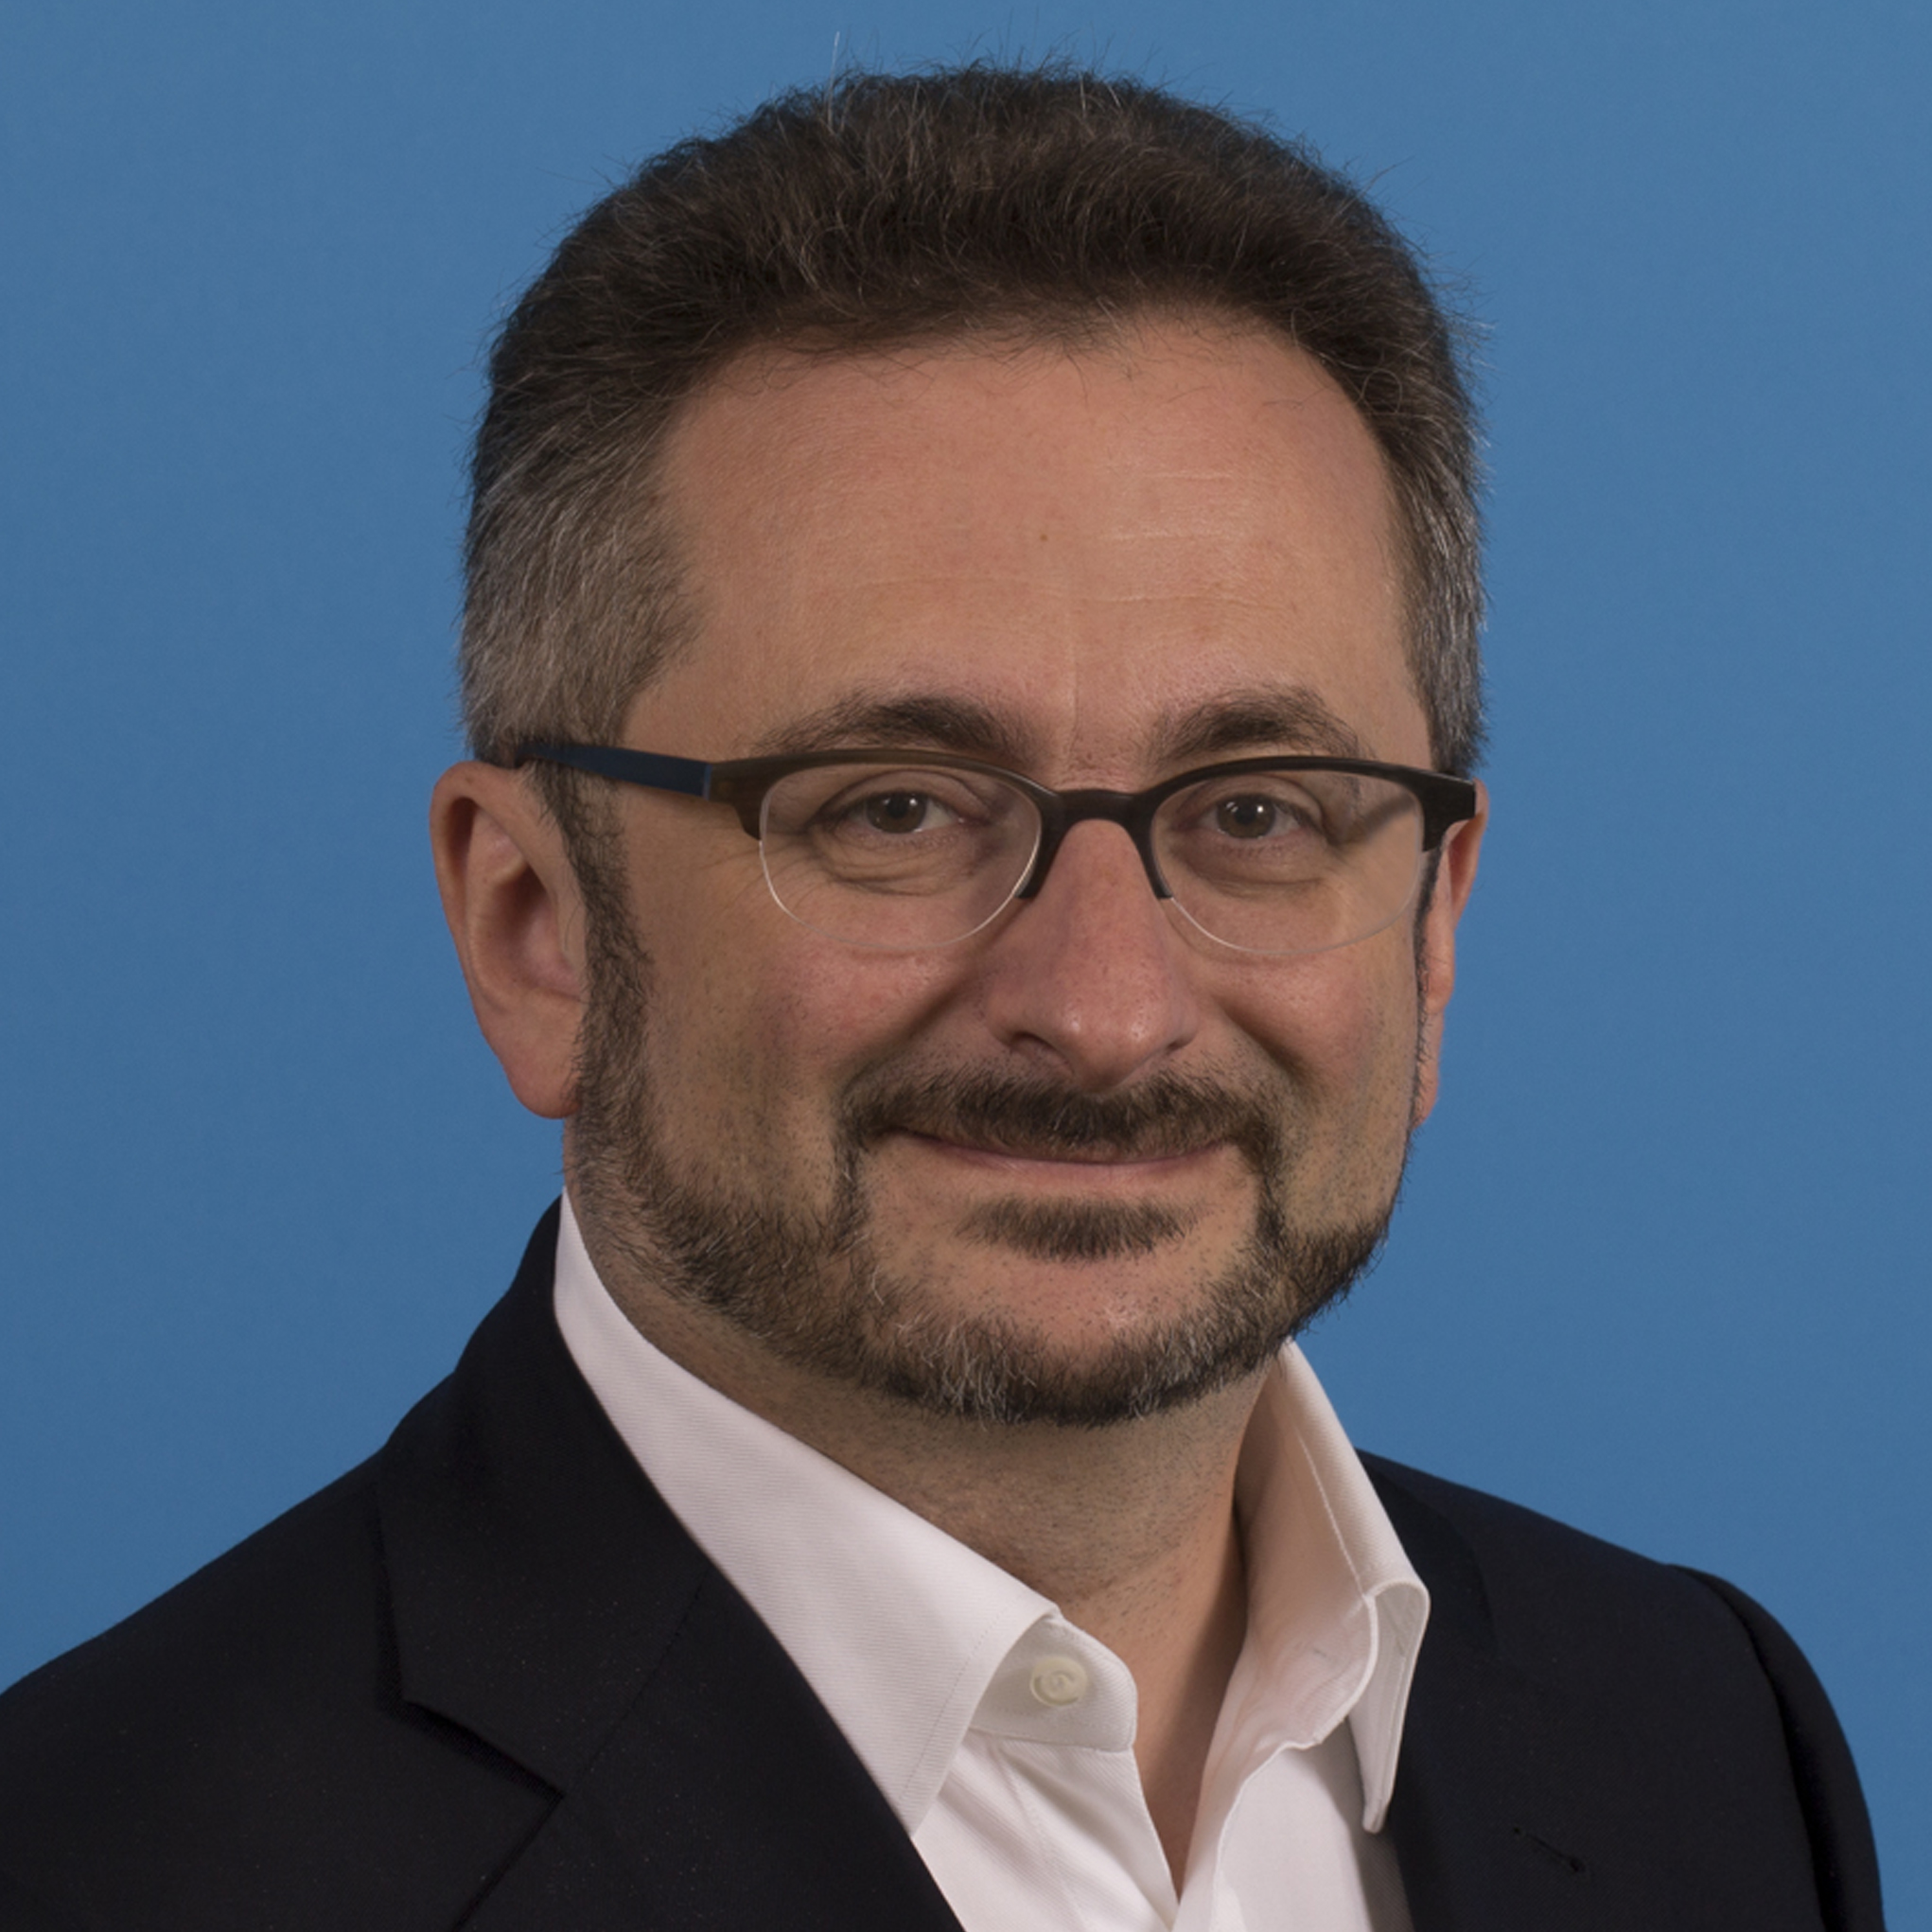 Professor Alexander Puzrin